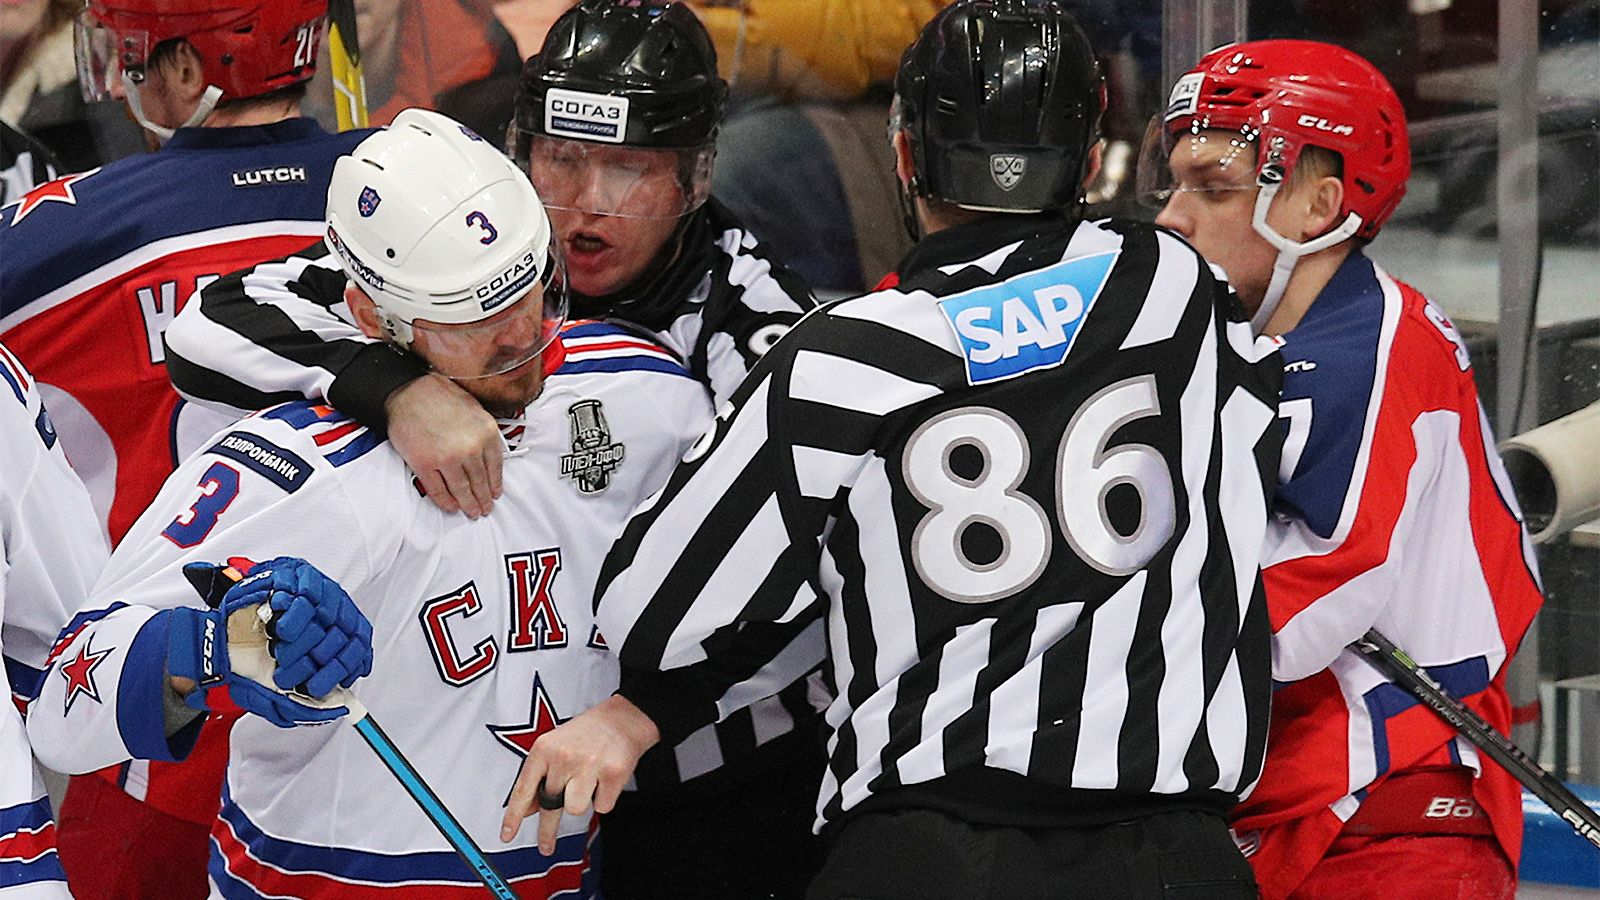 Хоккей кхл сегодняшние матчи [PUNIQRANDLINE-(au-dating-names.txt) 23